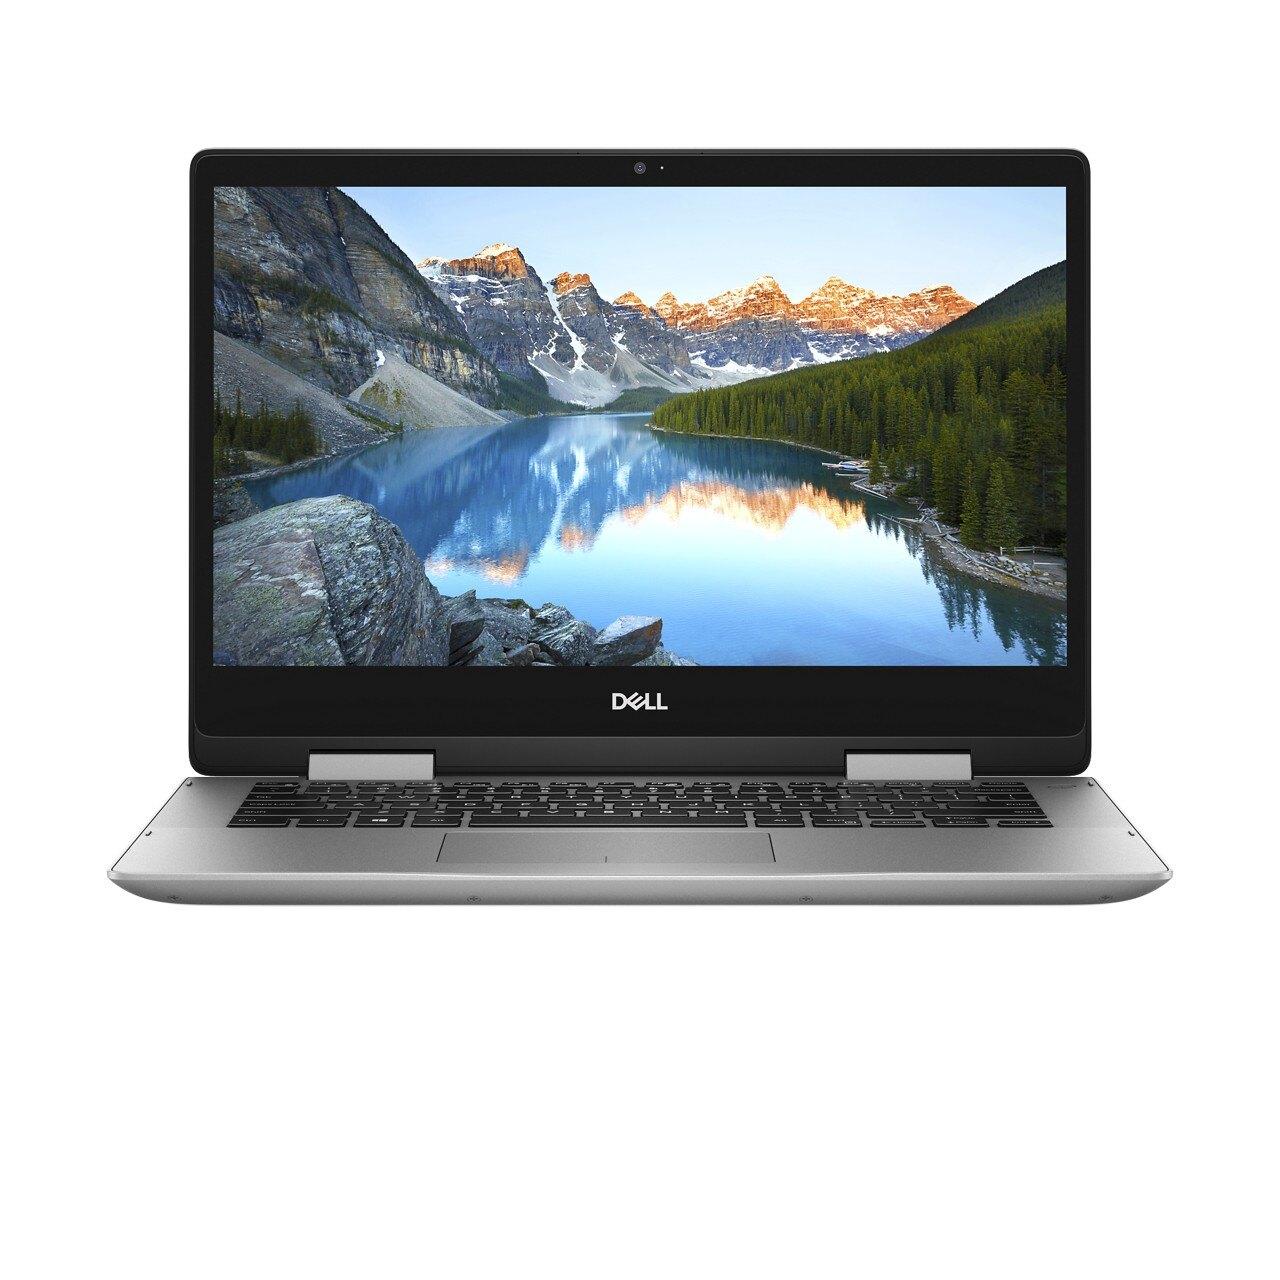 Dell Inspiron 14 5482 2-In-1 Laptop 14inch Touch Screen Intel i5-8265U 256GB SSD 8GB RAM : $679.99 +  $169.75 back in points + FS